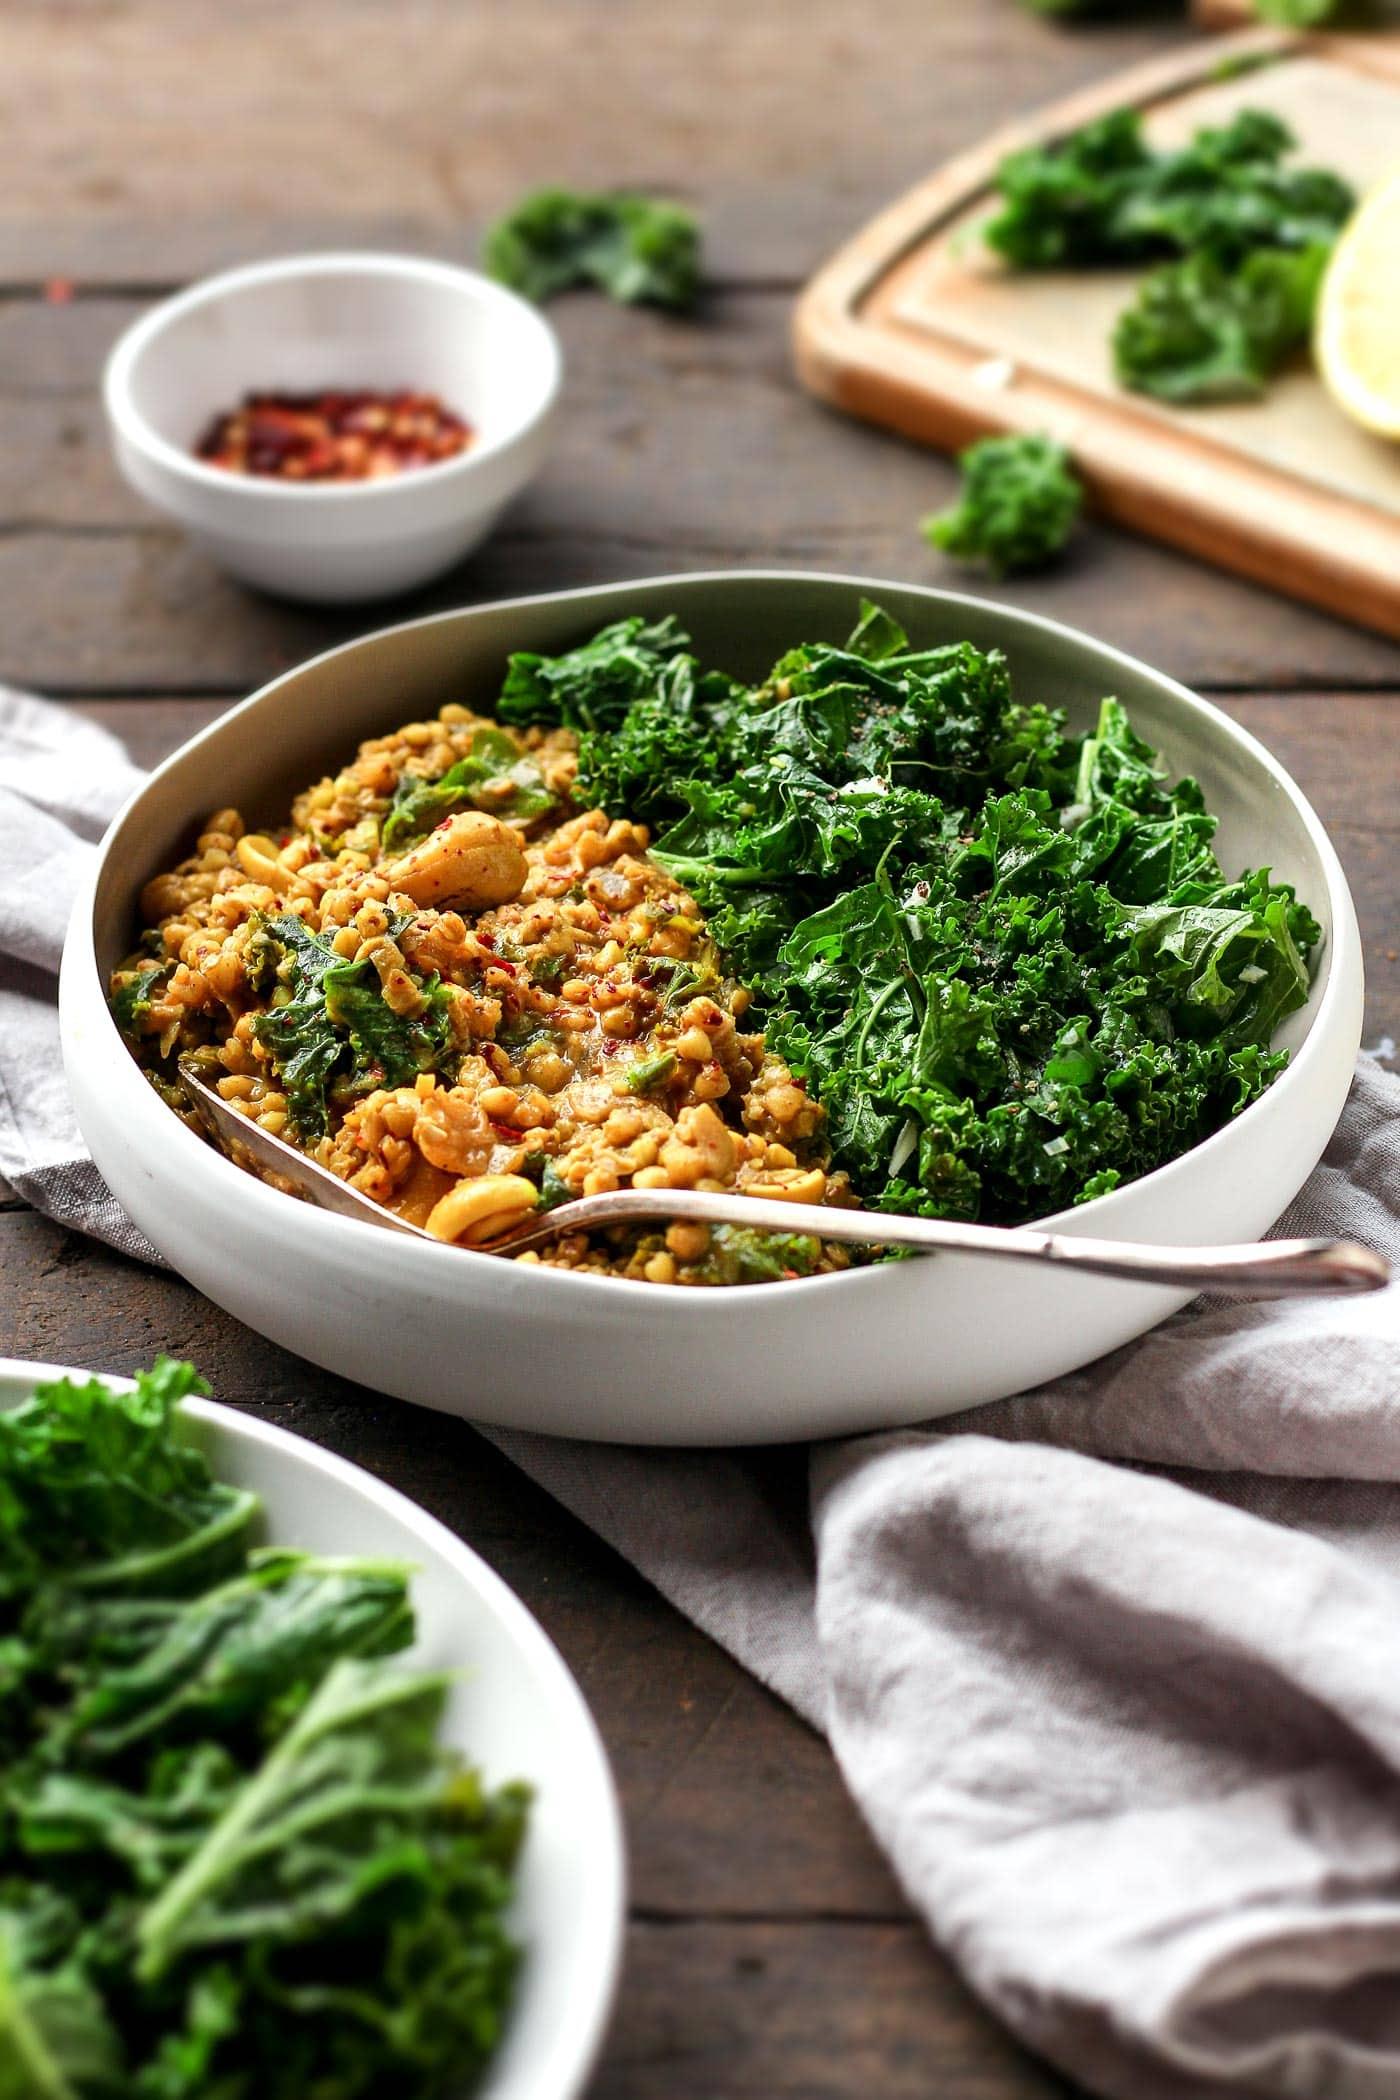 Buckwheat - meat substitute 47